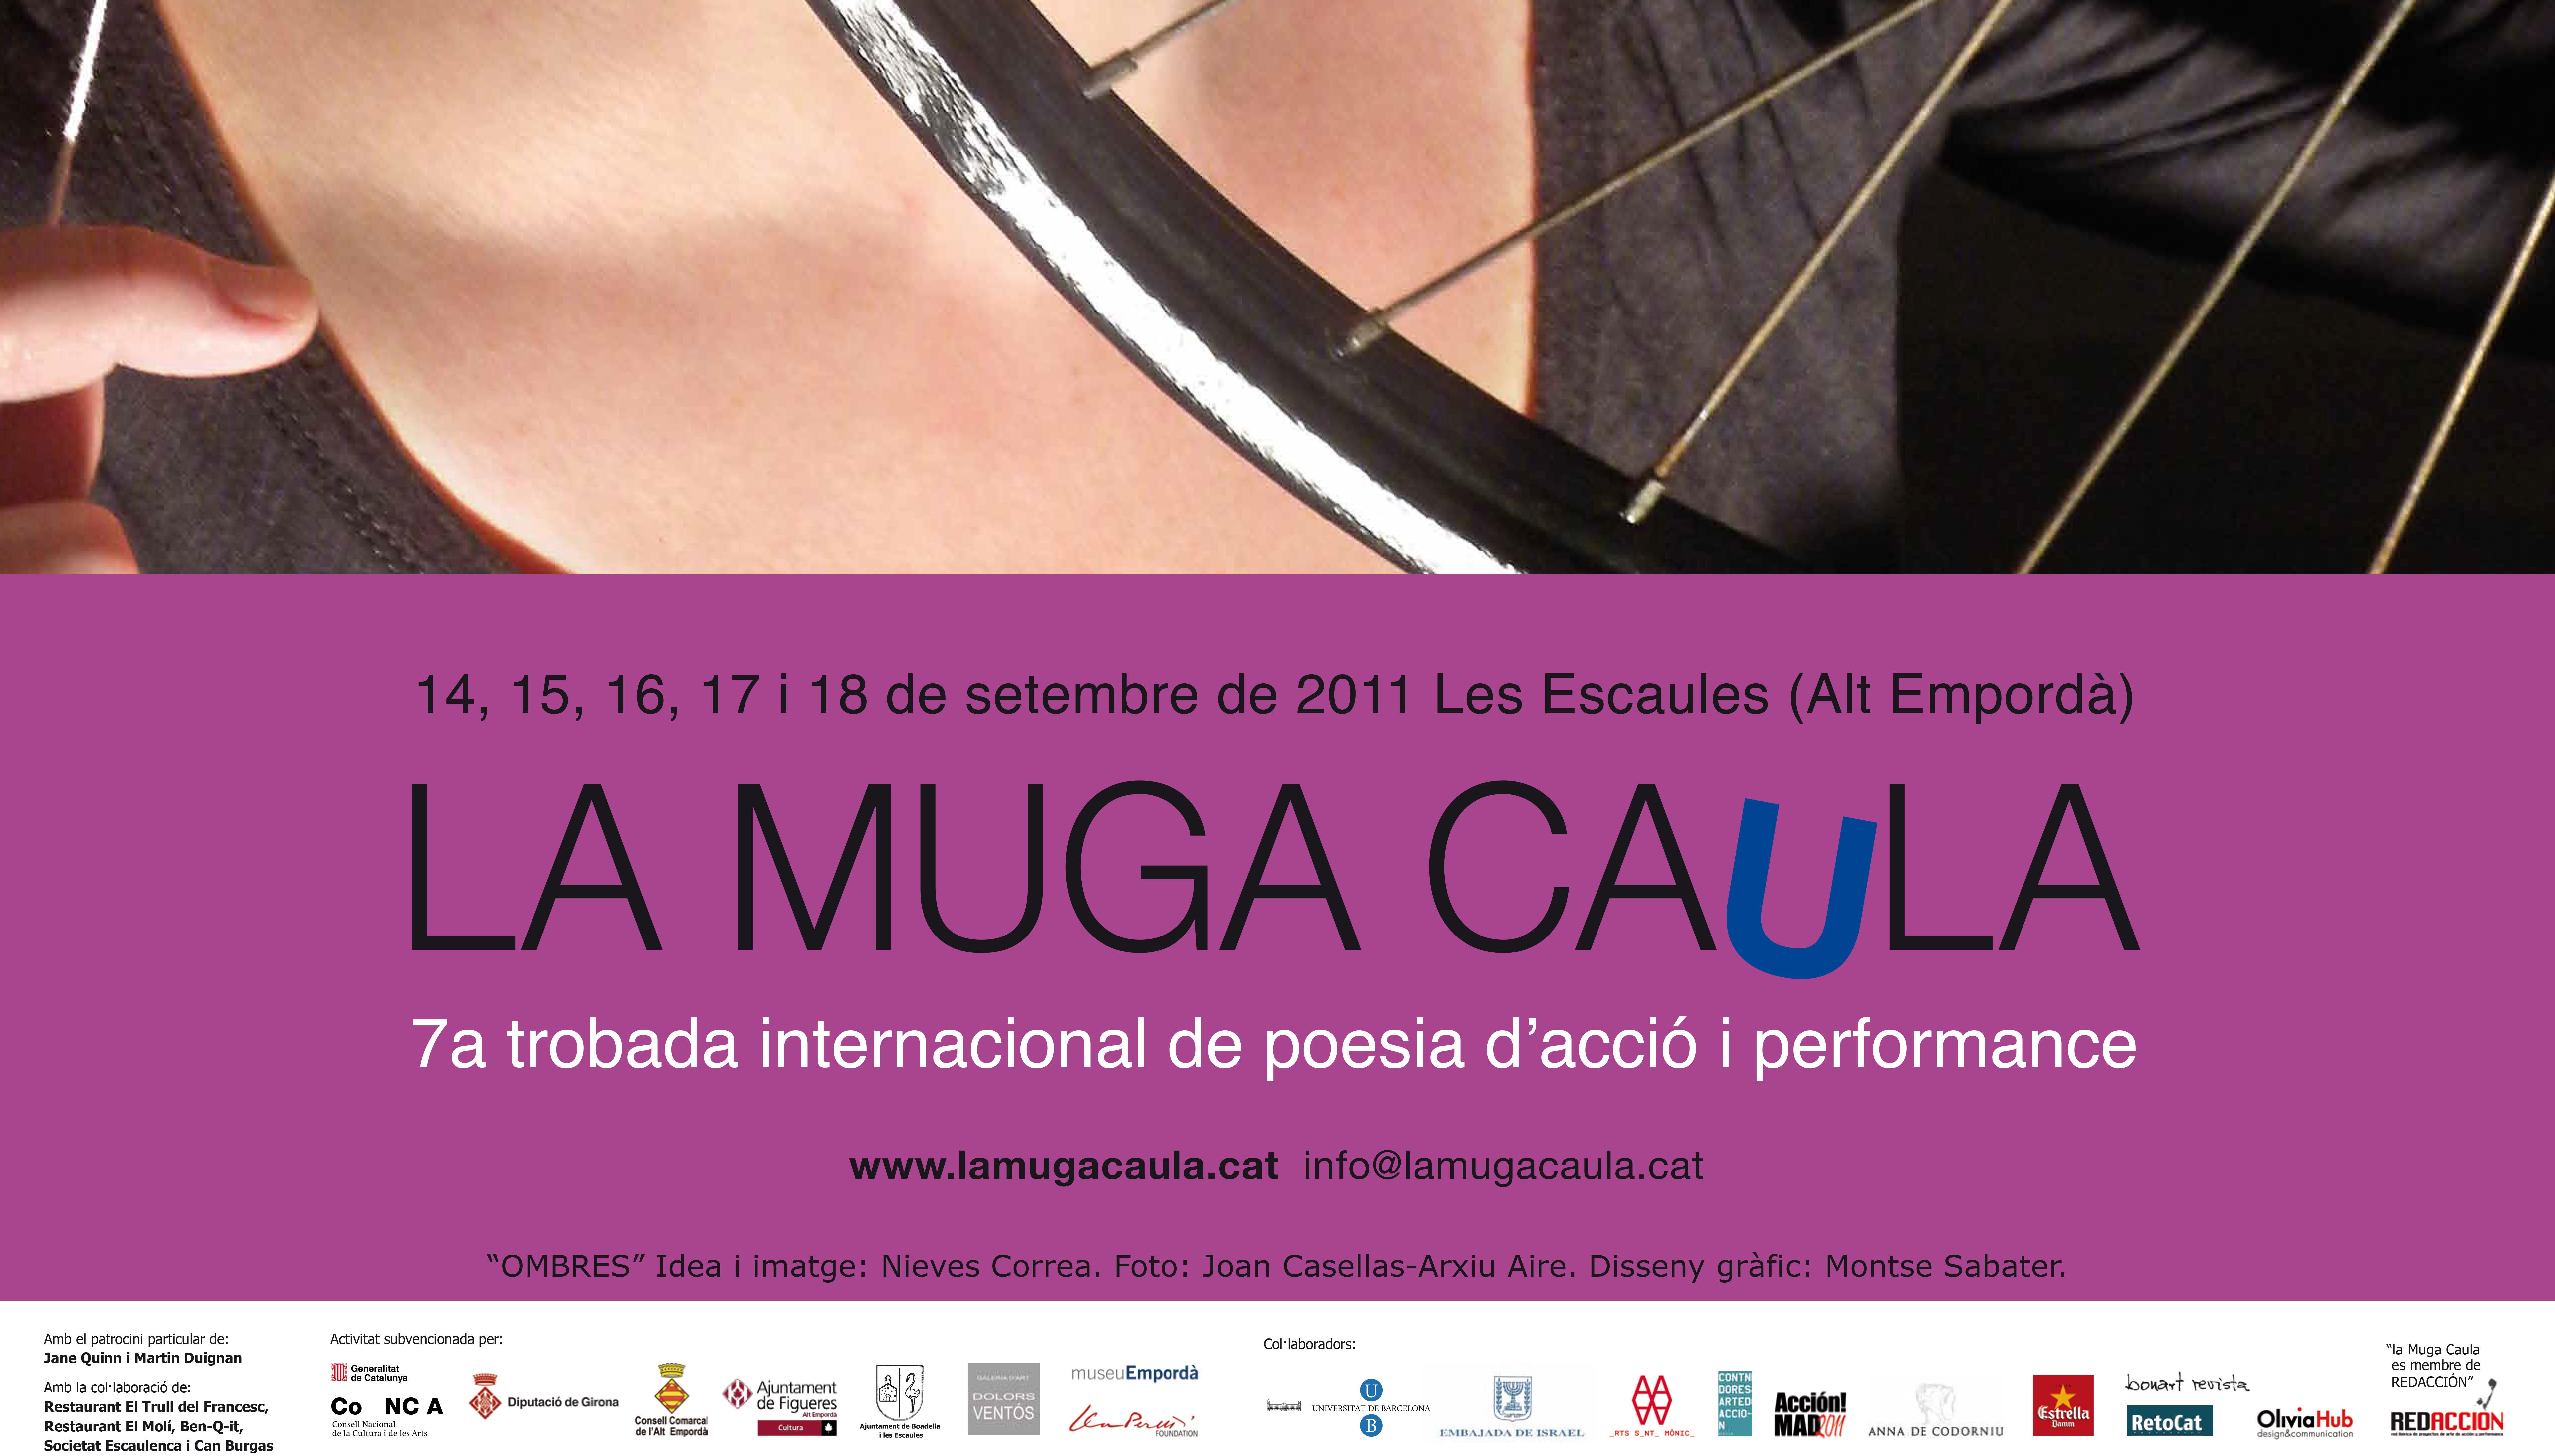 LA MUGA CAULA, Escaules, Gerona, 14-18.9.11